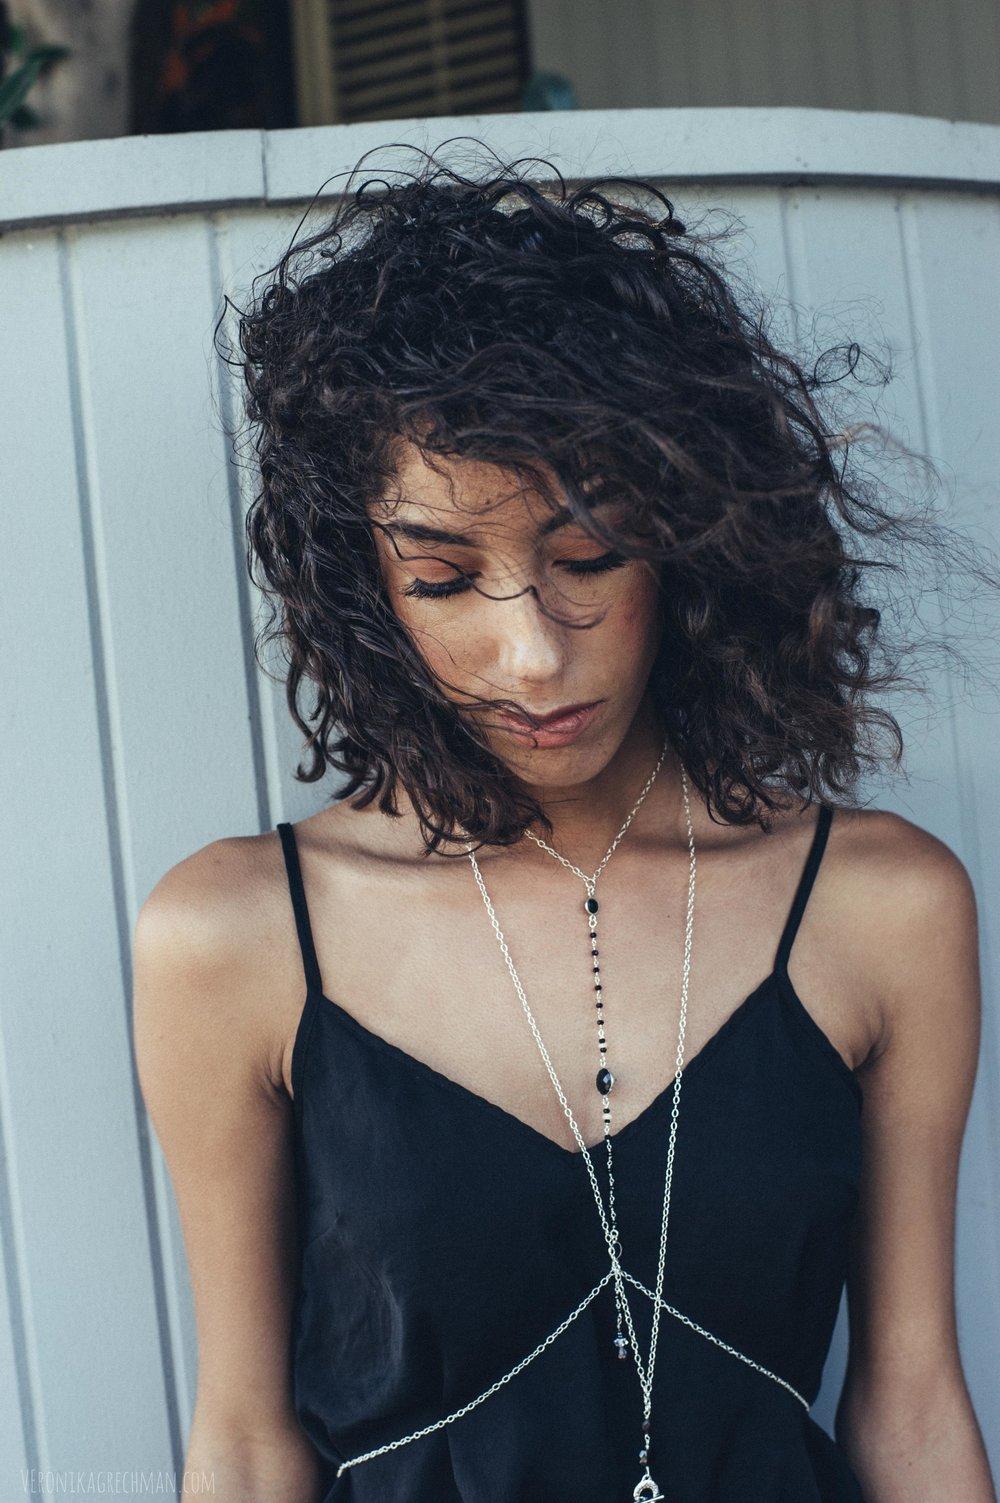 Jewellery fashion photoshoot ideas